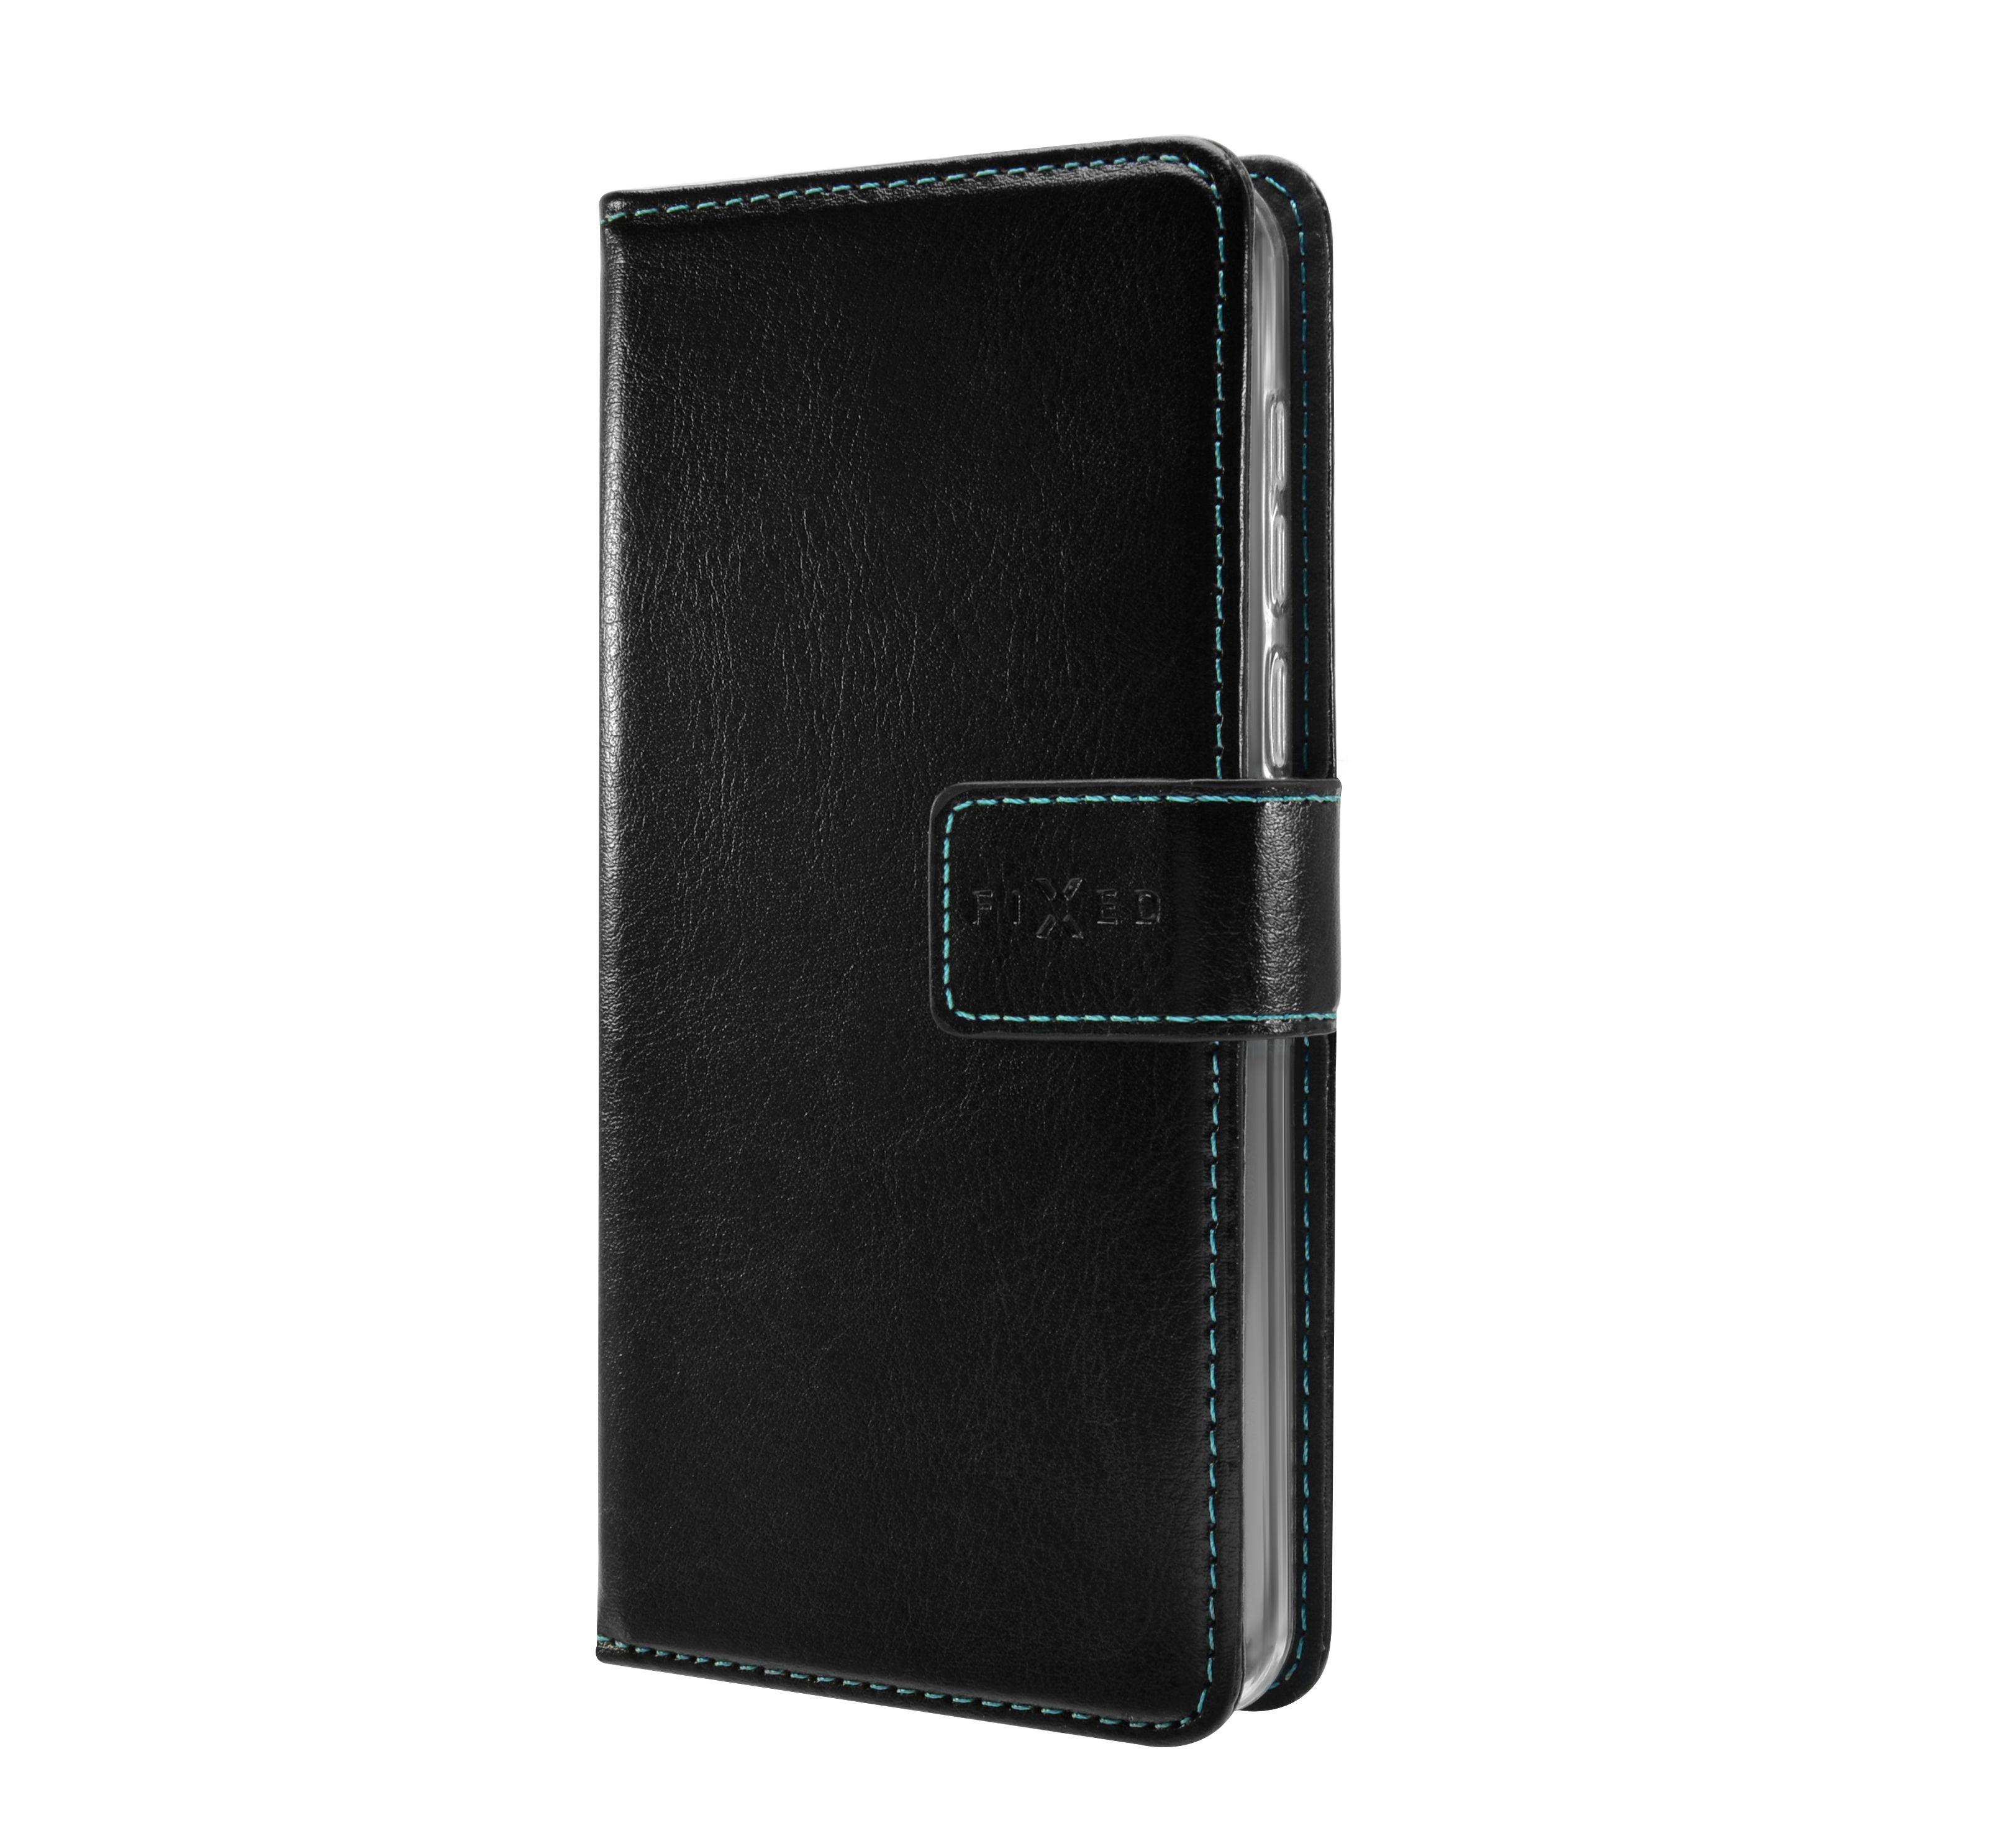 Pouzdro typu kniha FIXED Opus pro Nokia 3.1, černé